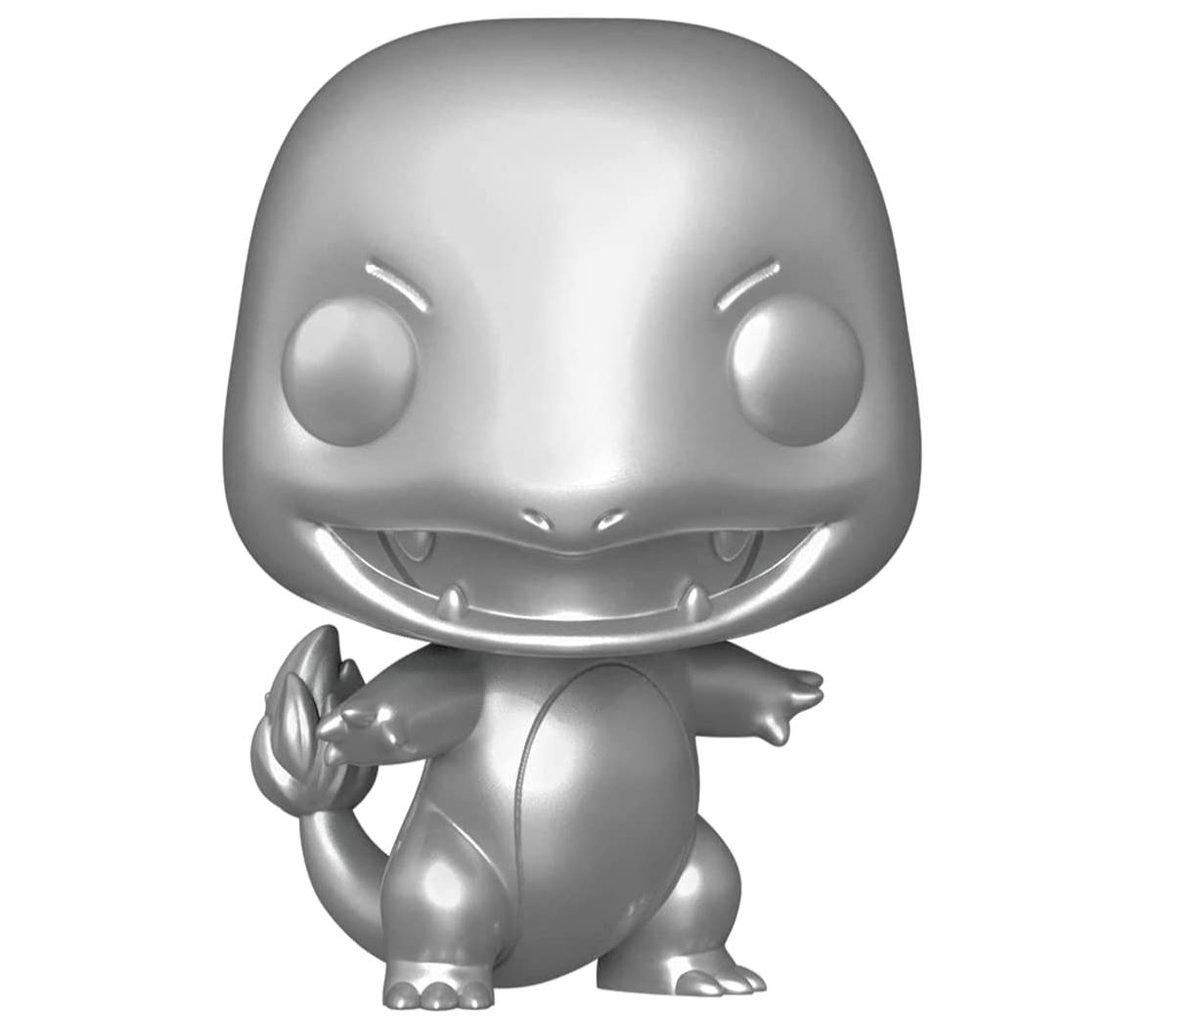 Funko Pop! Games: Pokemon - Charmander (Silver Metallic) $8.79 via Amazon (Prime Eligible).